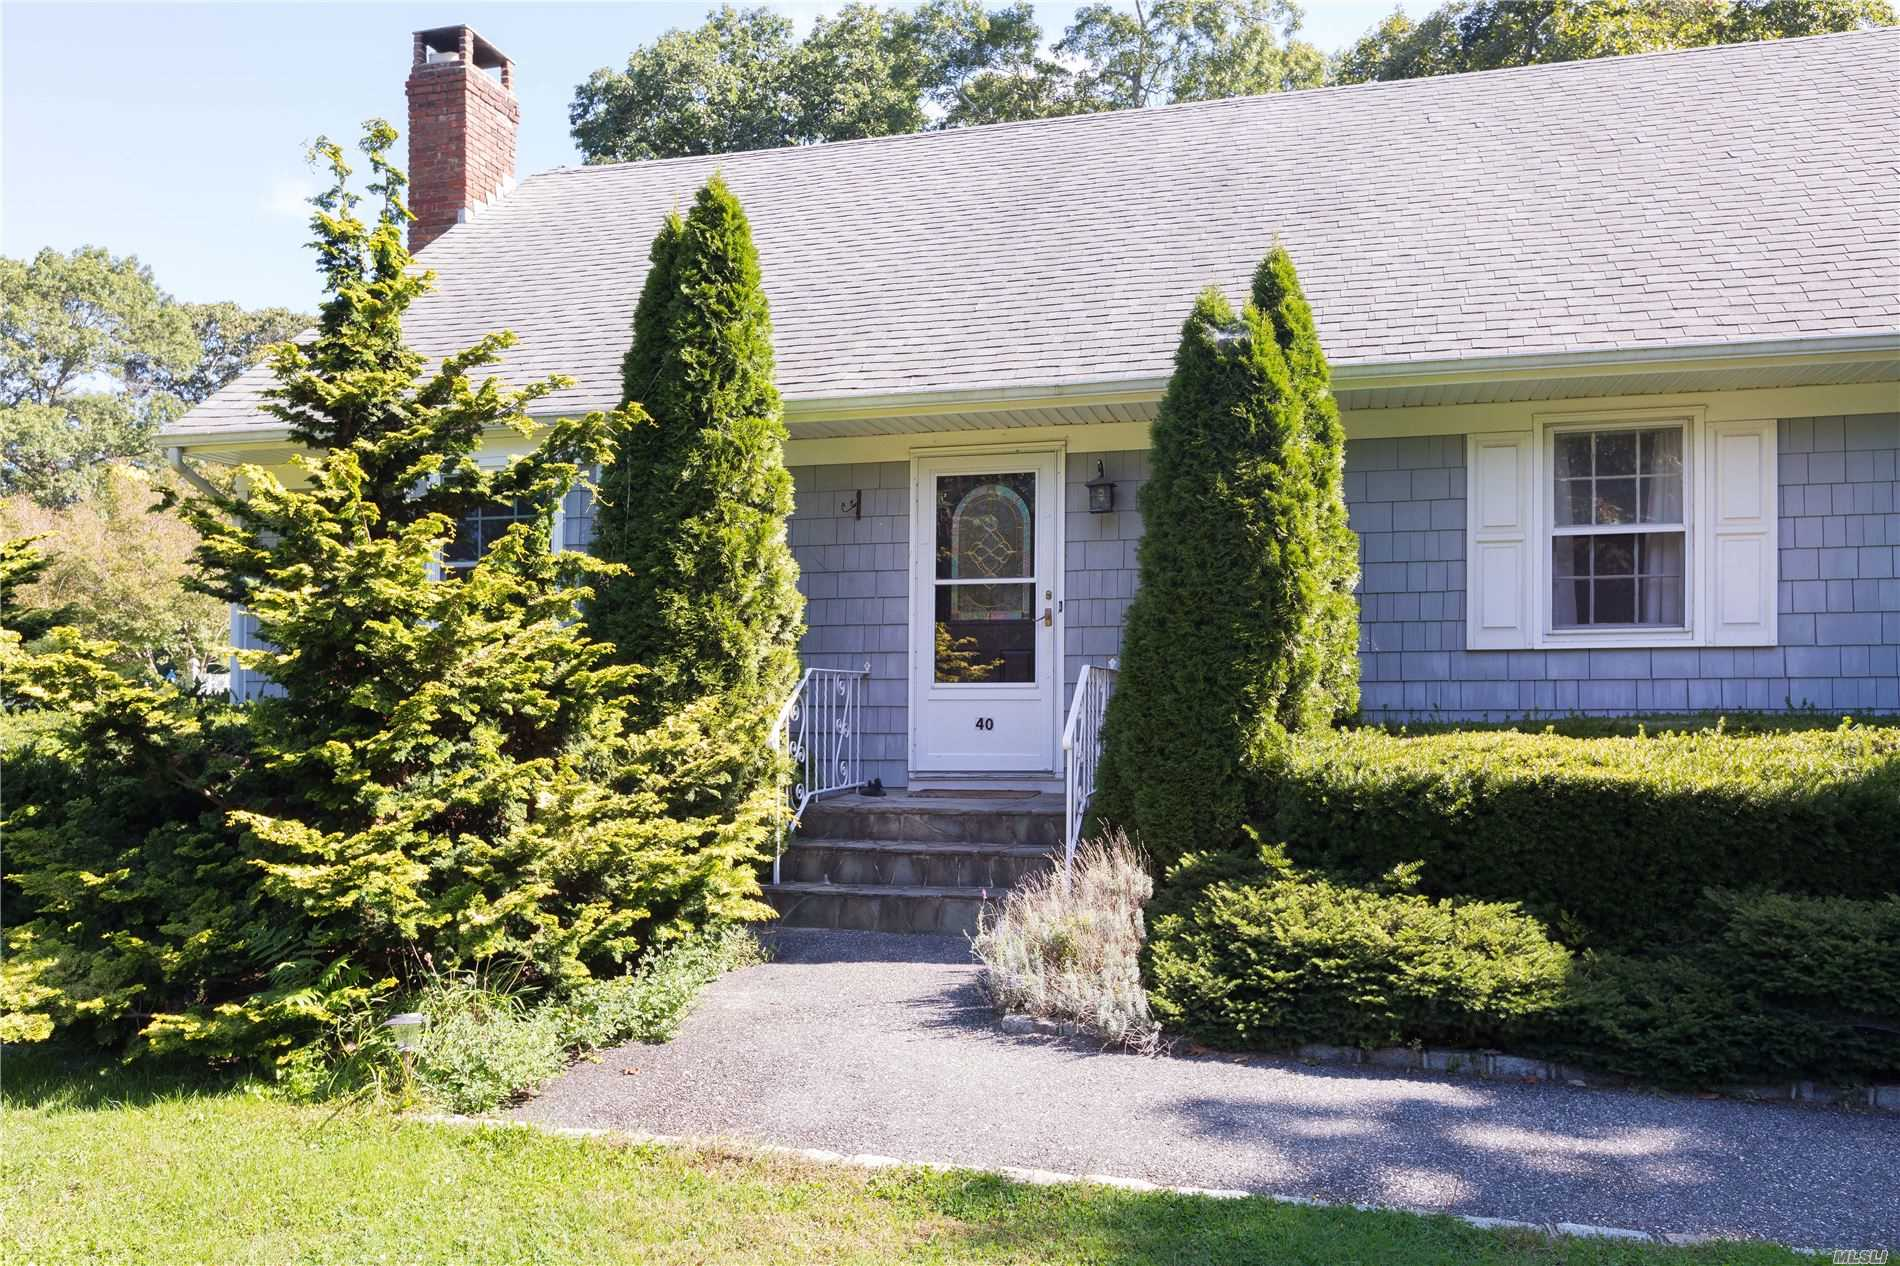 40 Colonial Dr Aquebogue, NY 11931